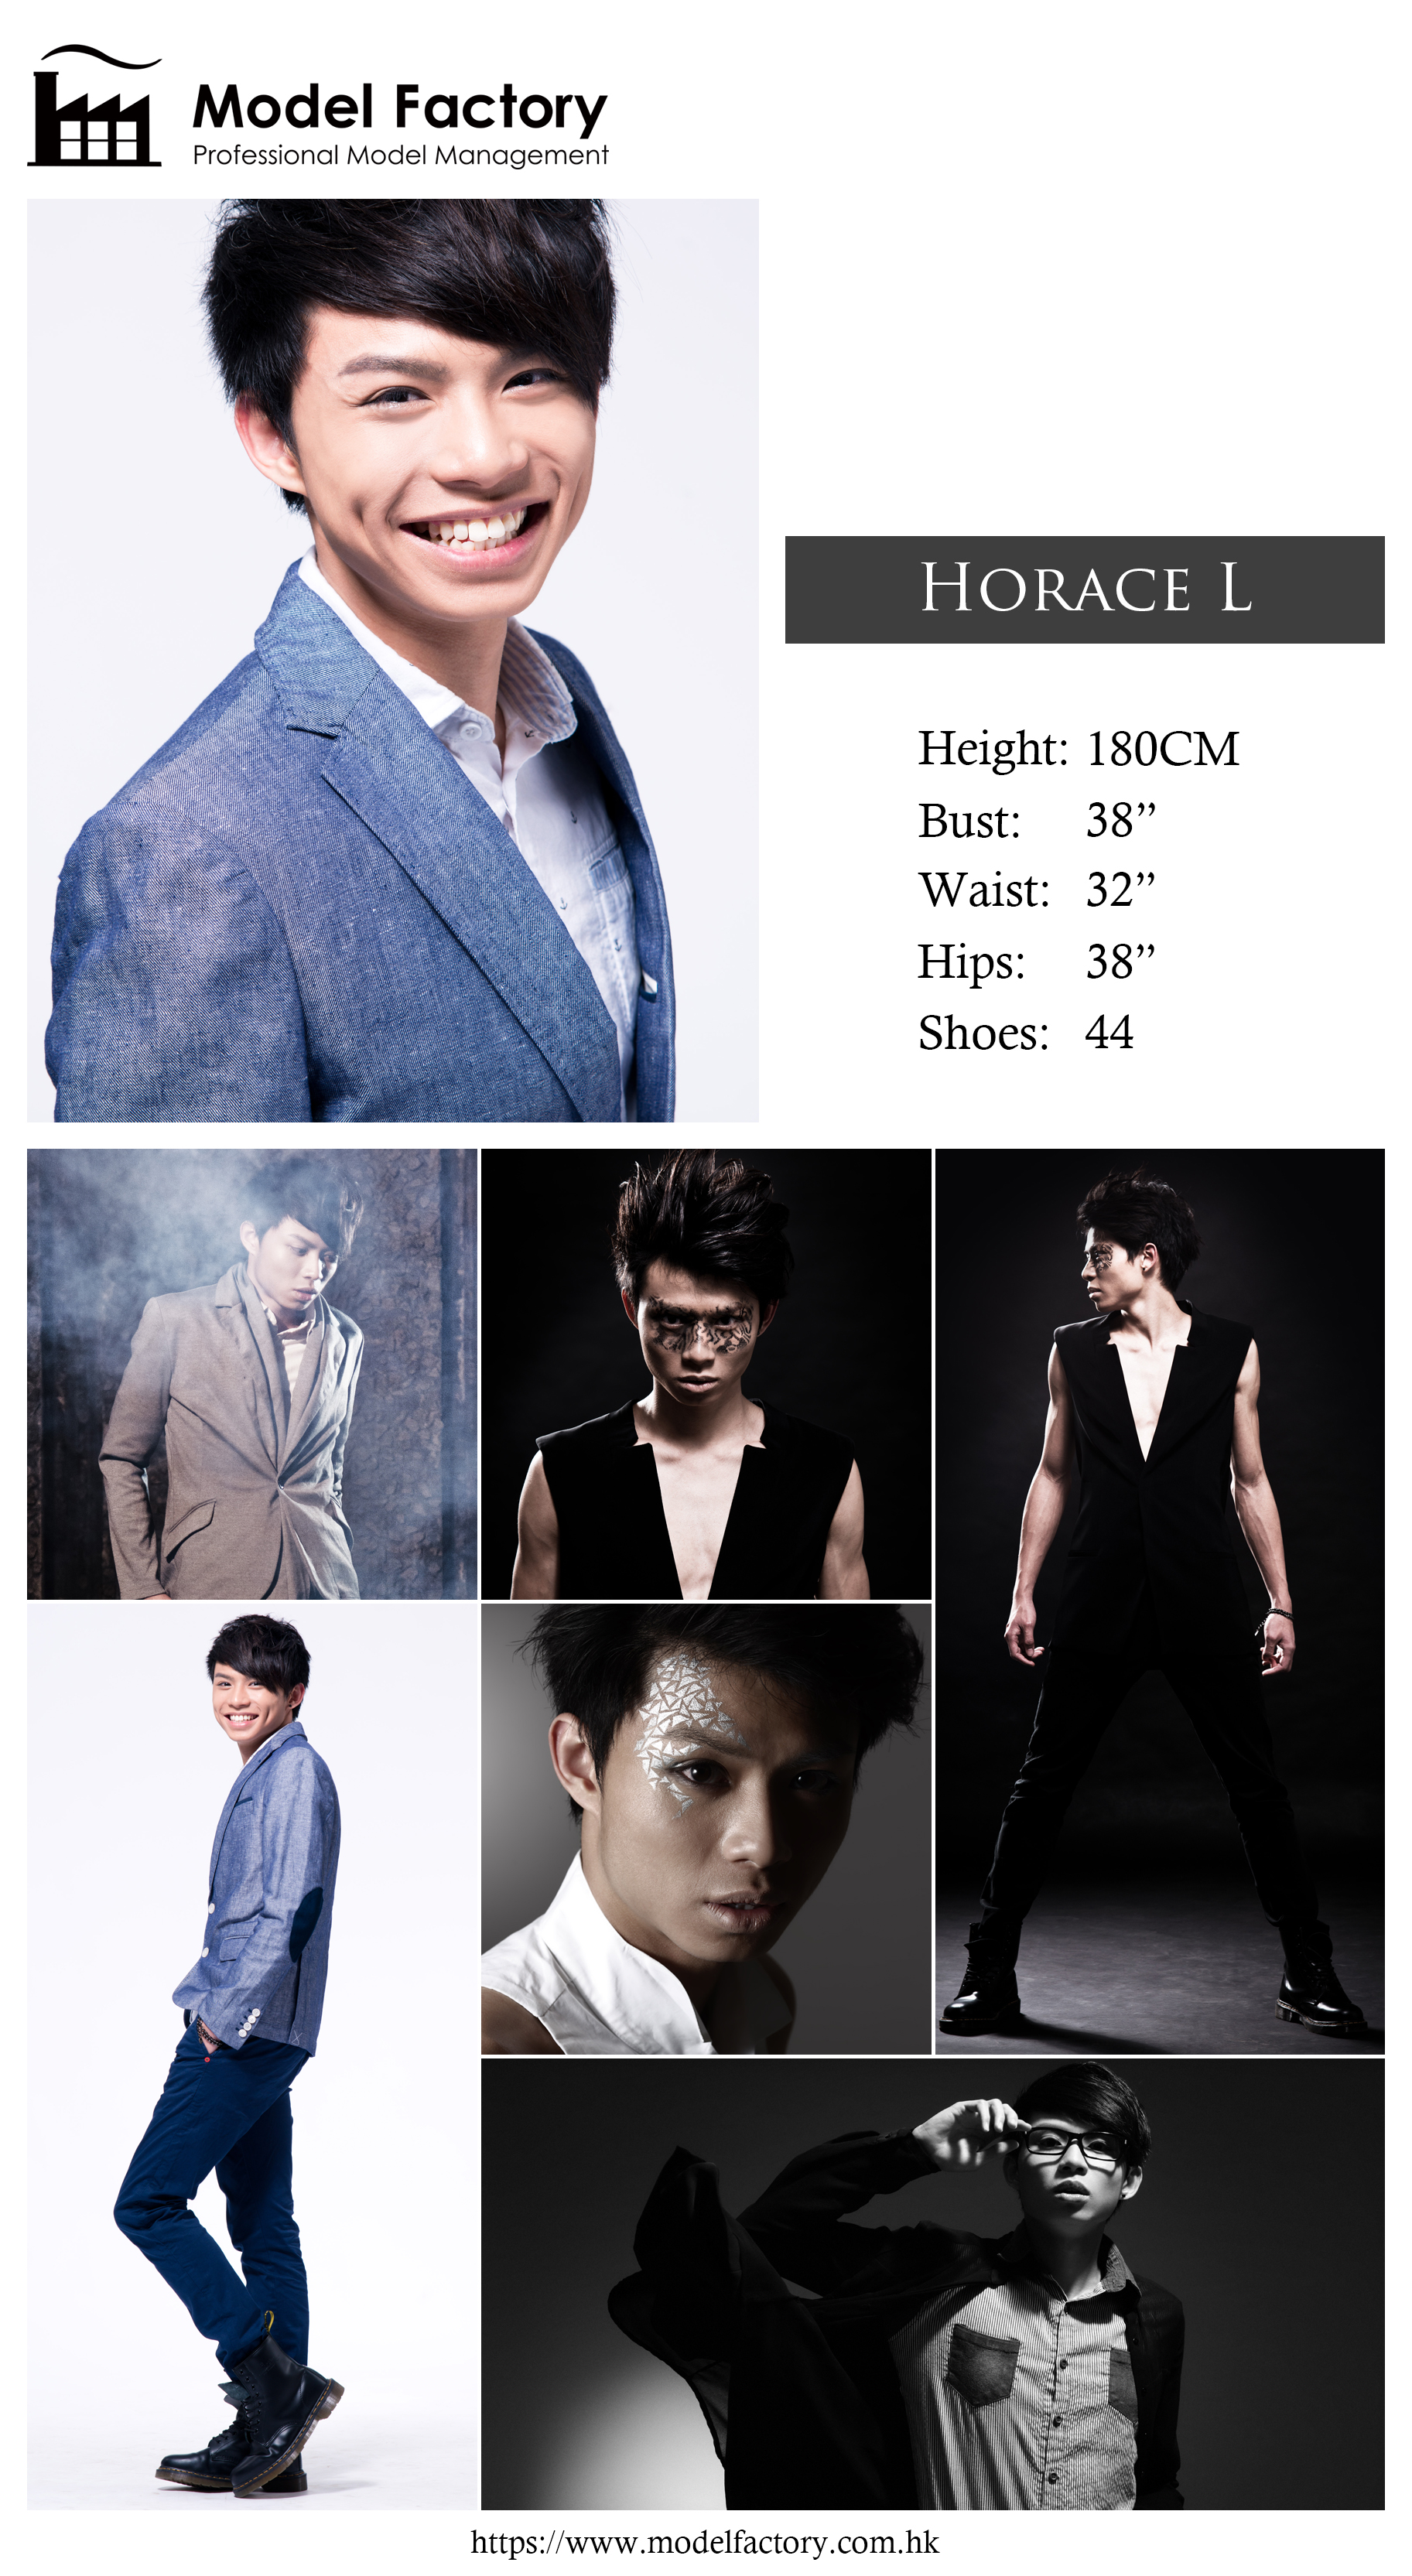 Model Factory Hong Kong Male Model HoraceL